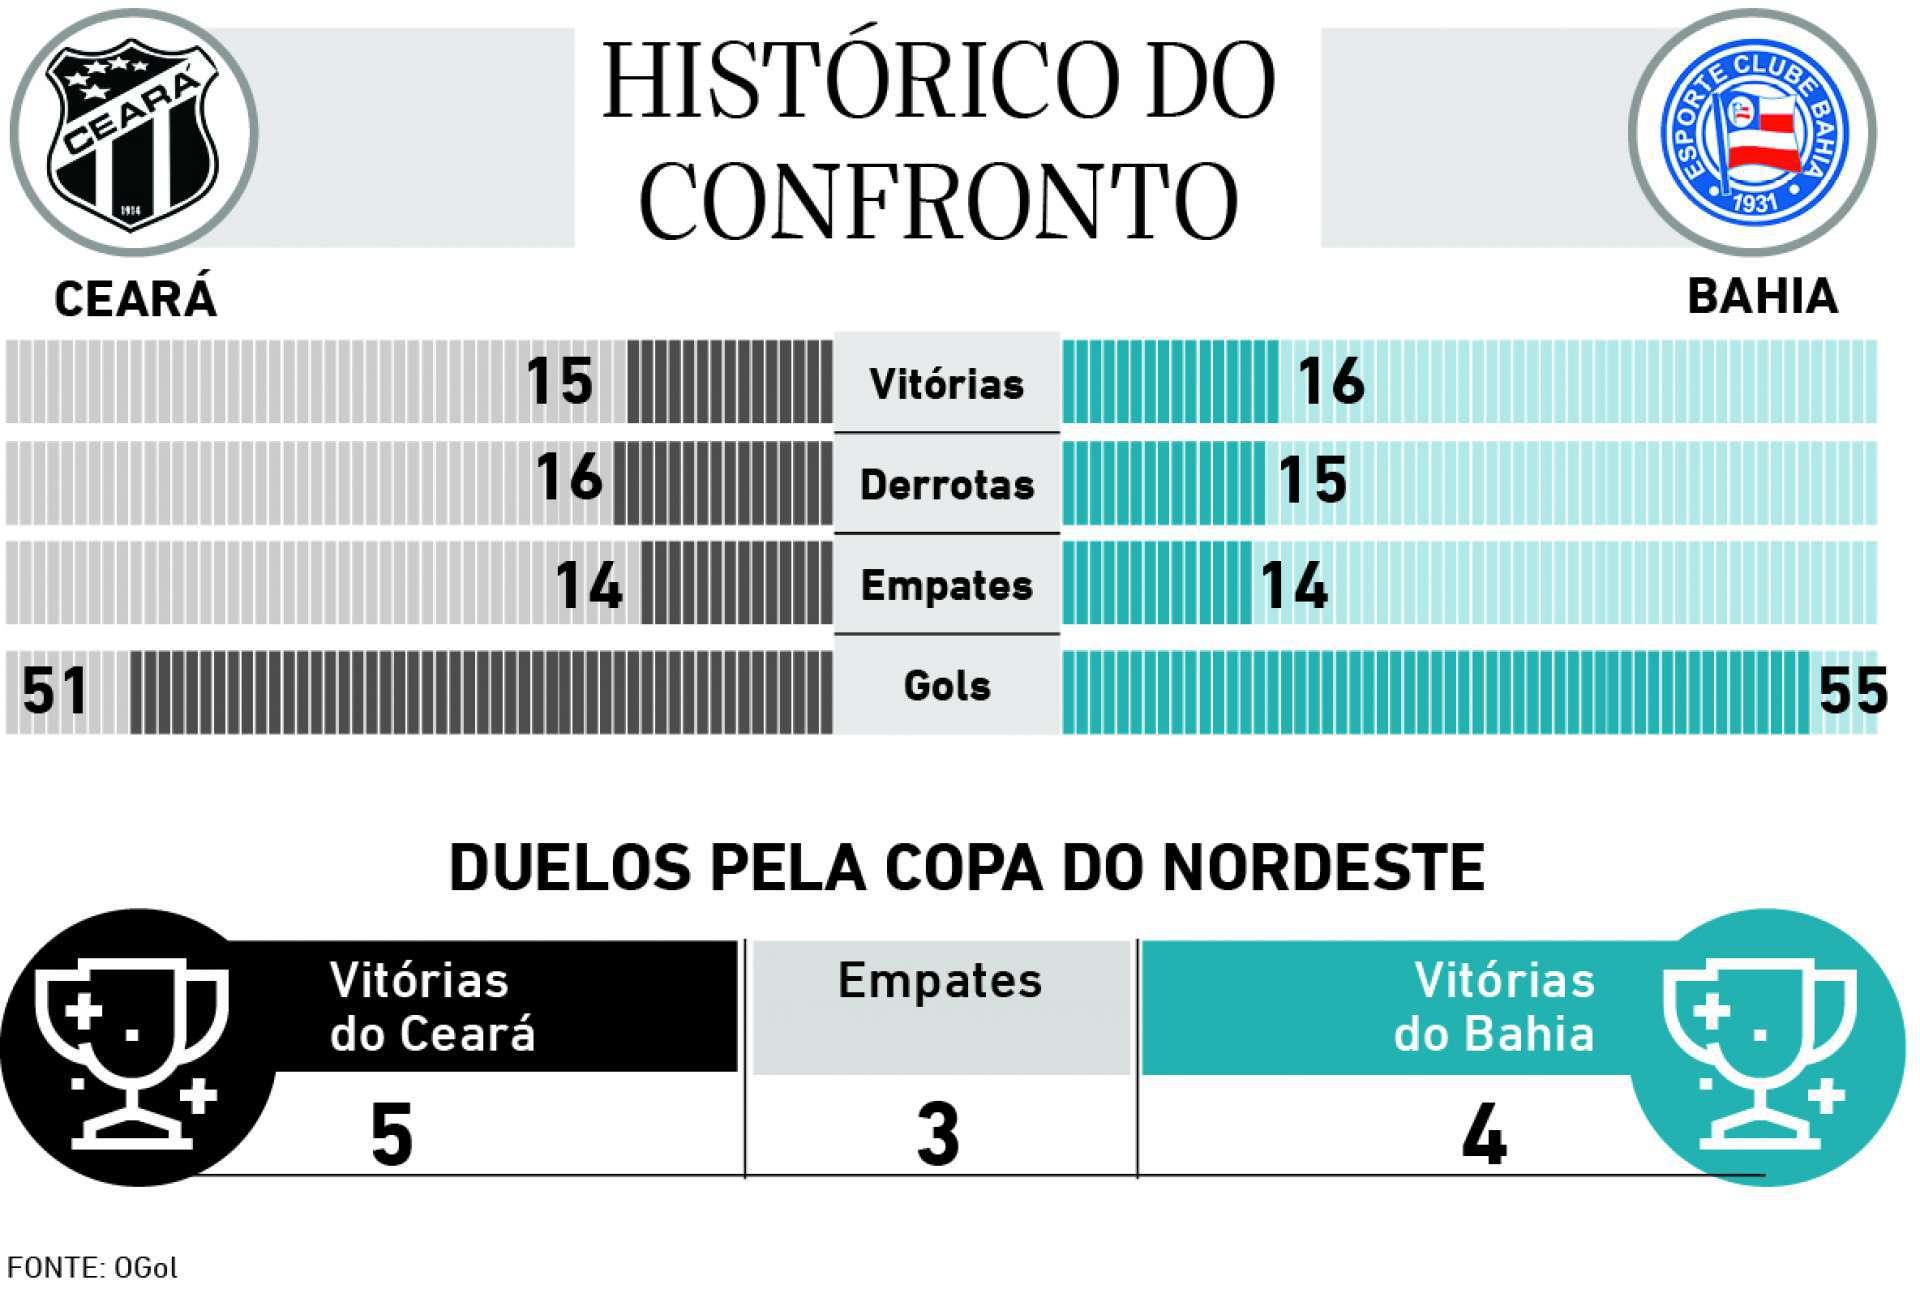 Historico do confronto